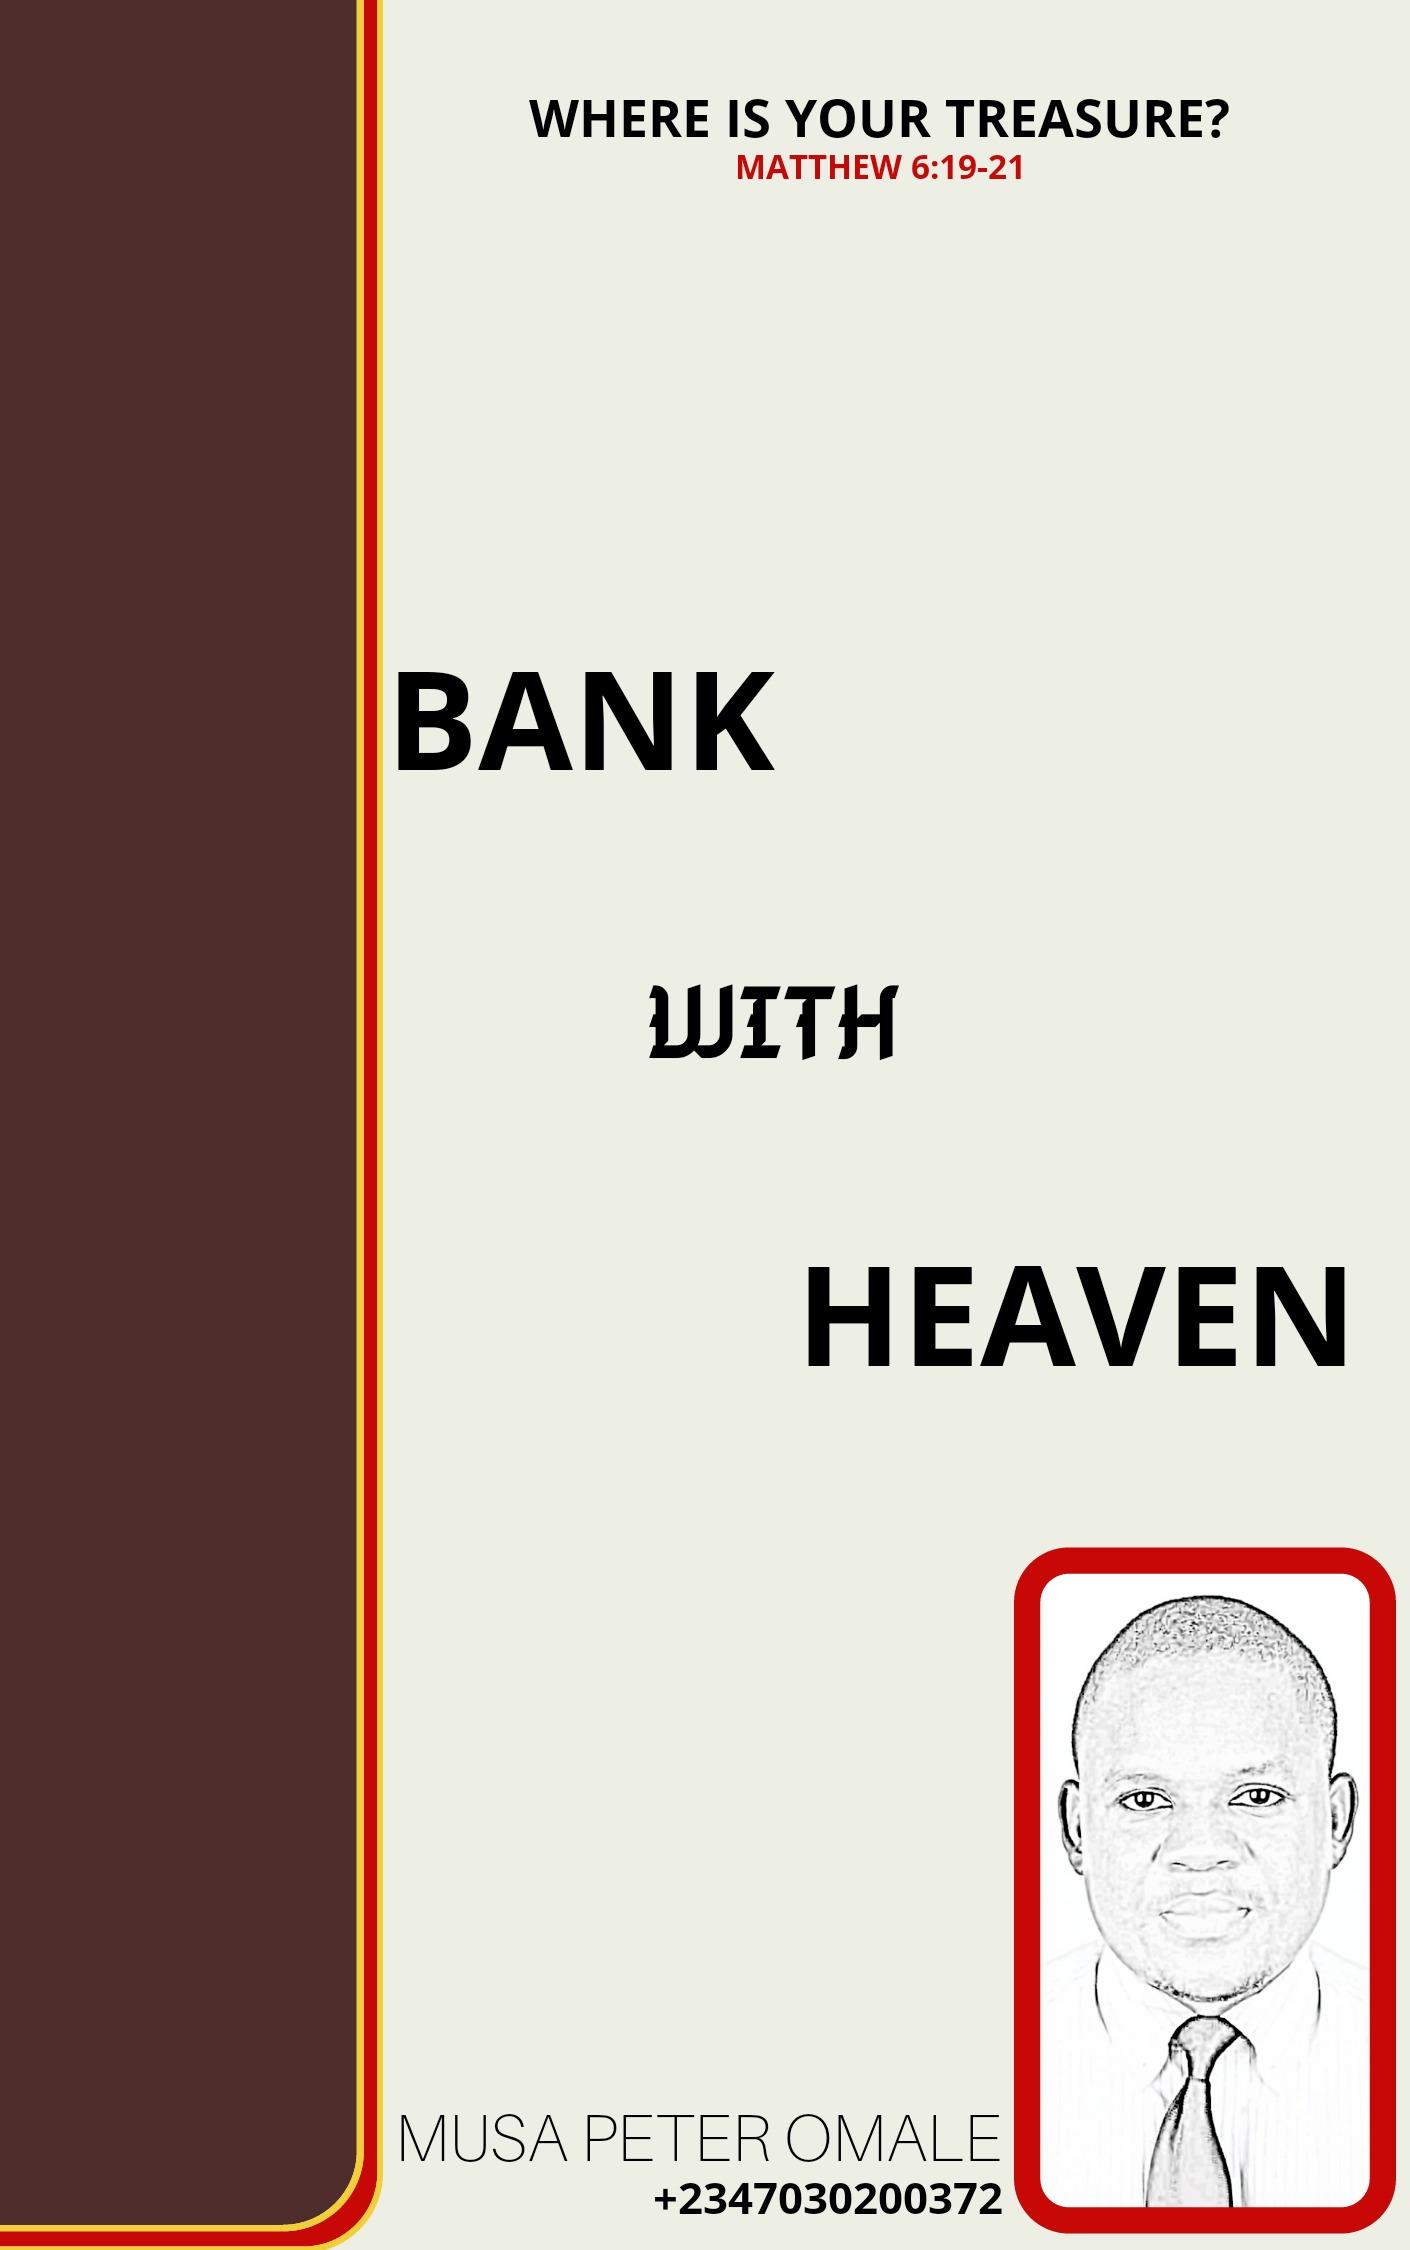 BANK WITH HEAVEN